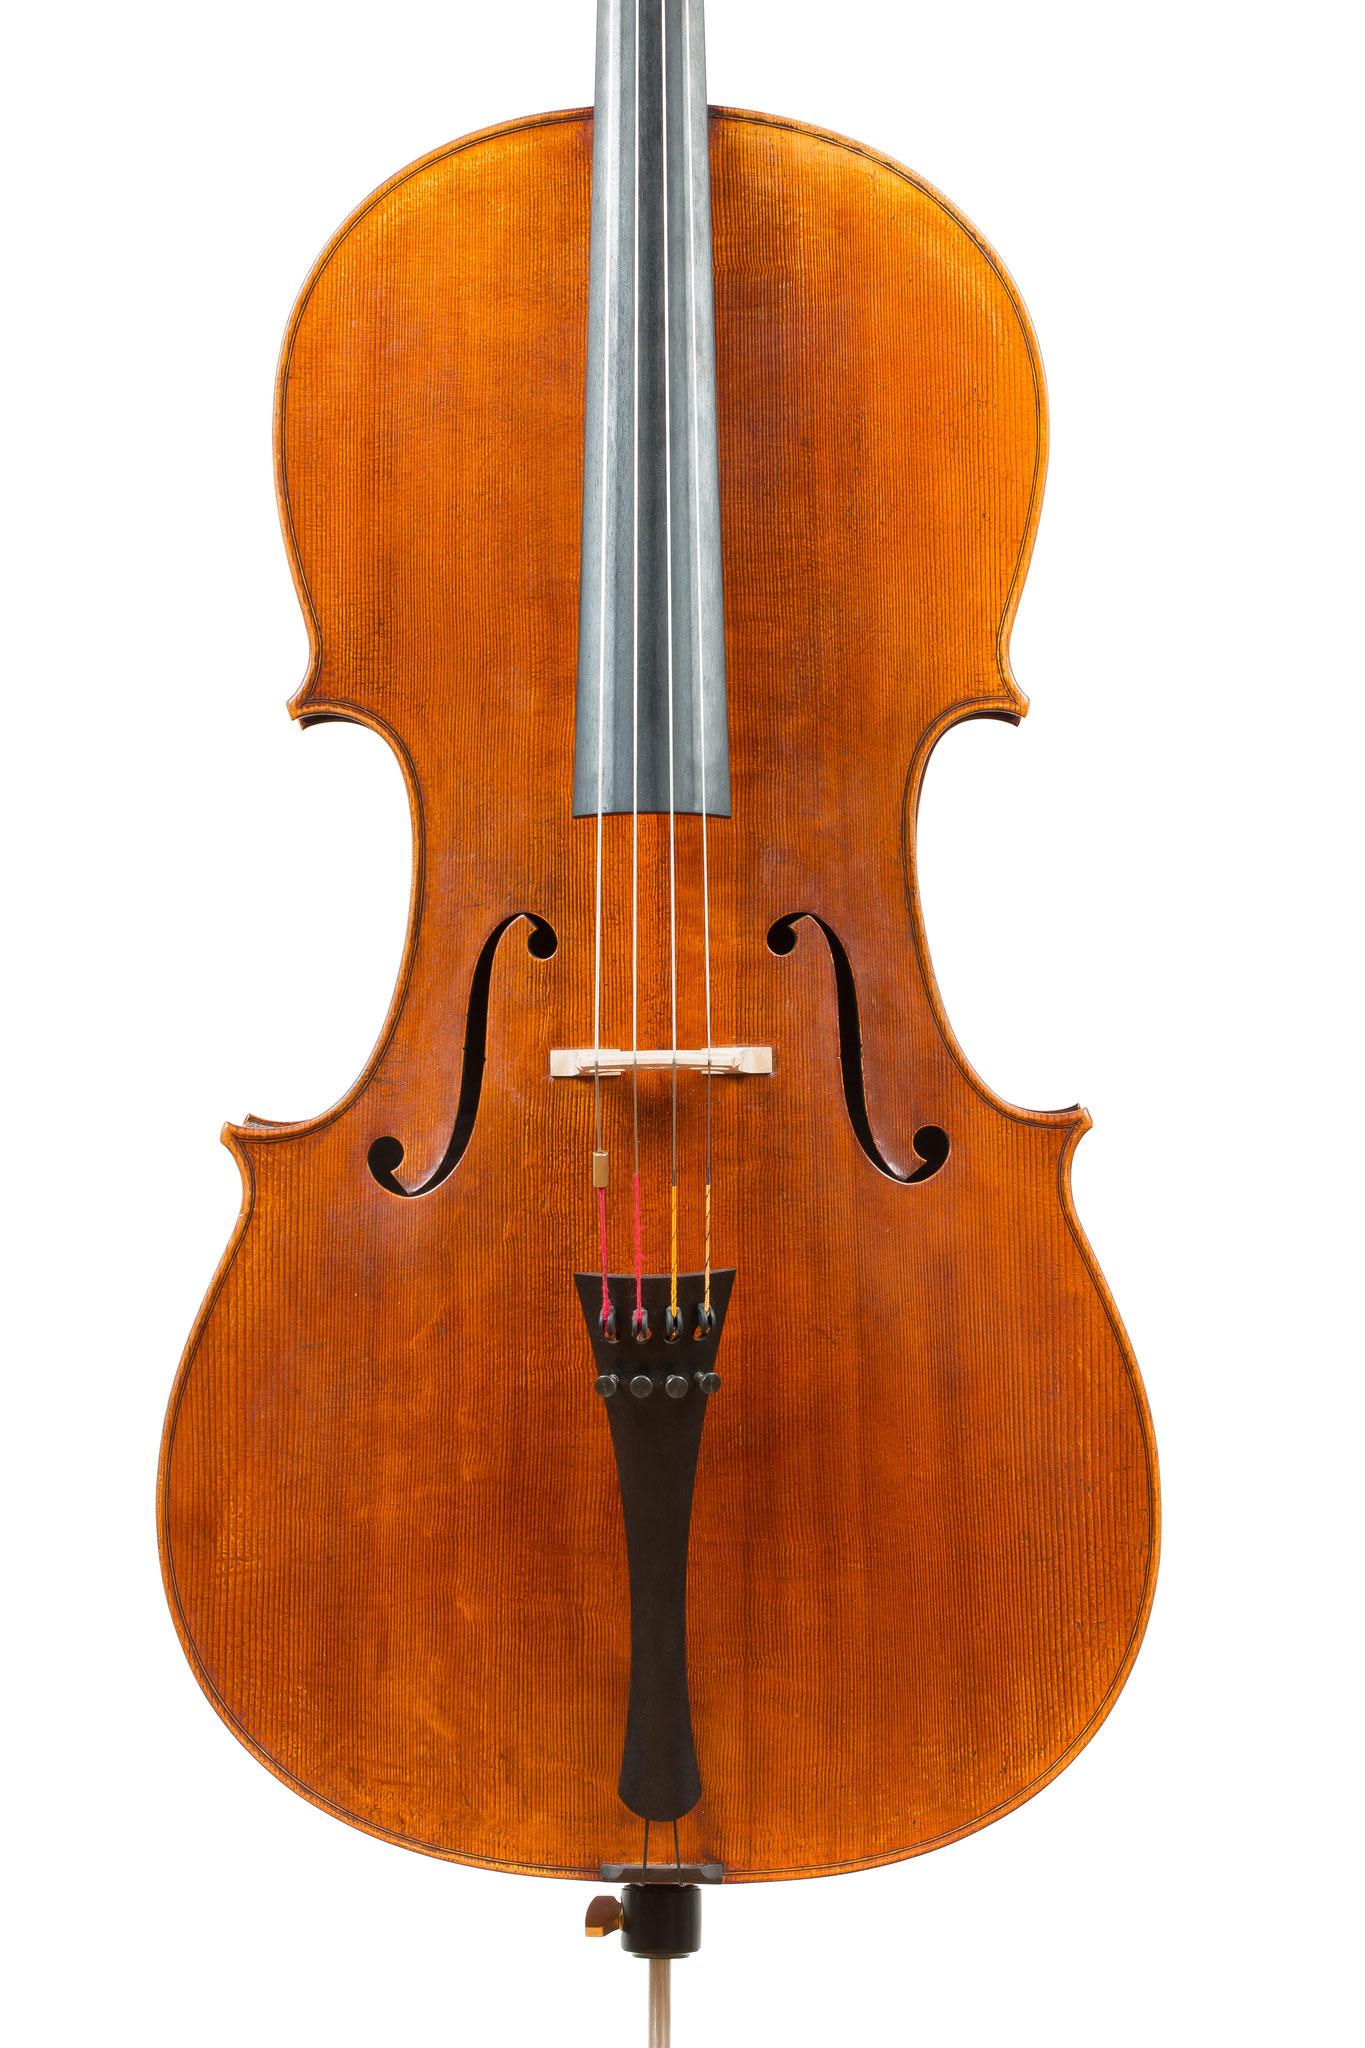 "Violoncello after Antonio Stradivari Forma B piccola ""ex-Feuermann"" (2012/CH), Photo: VDB Photography"